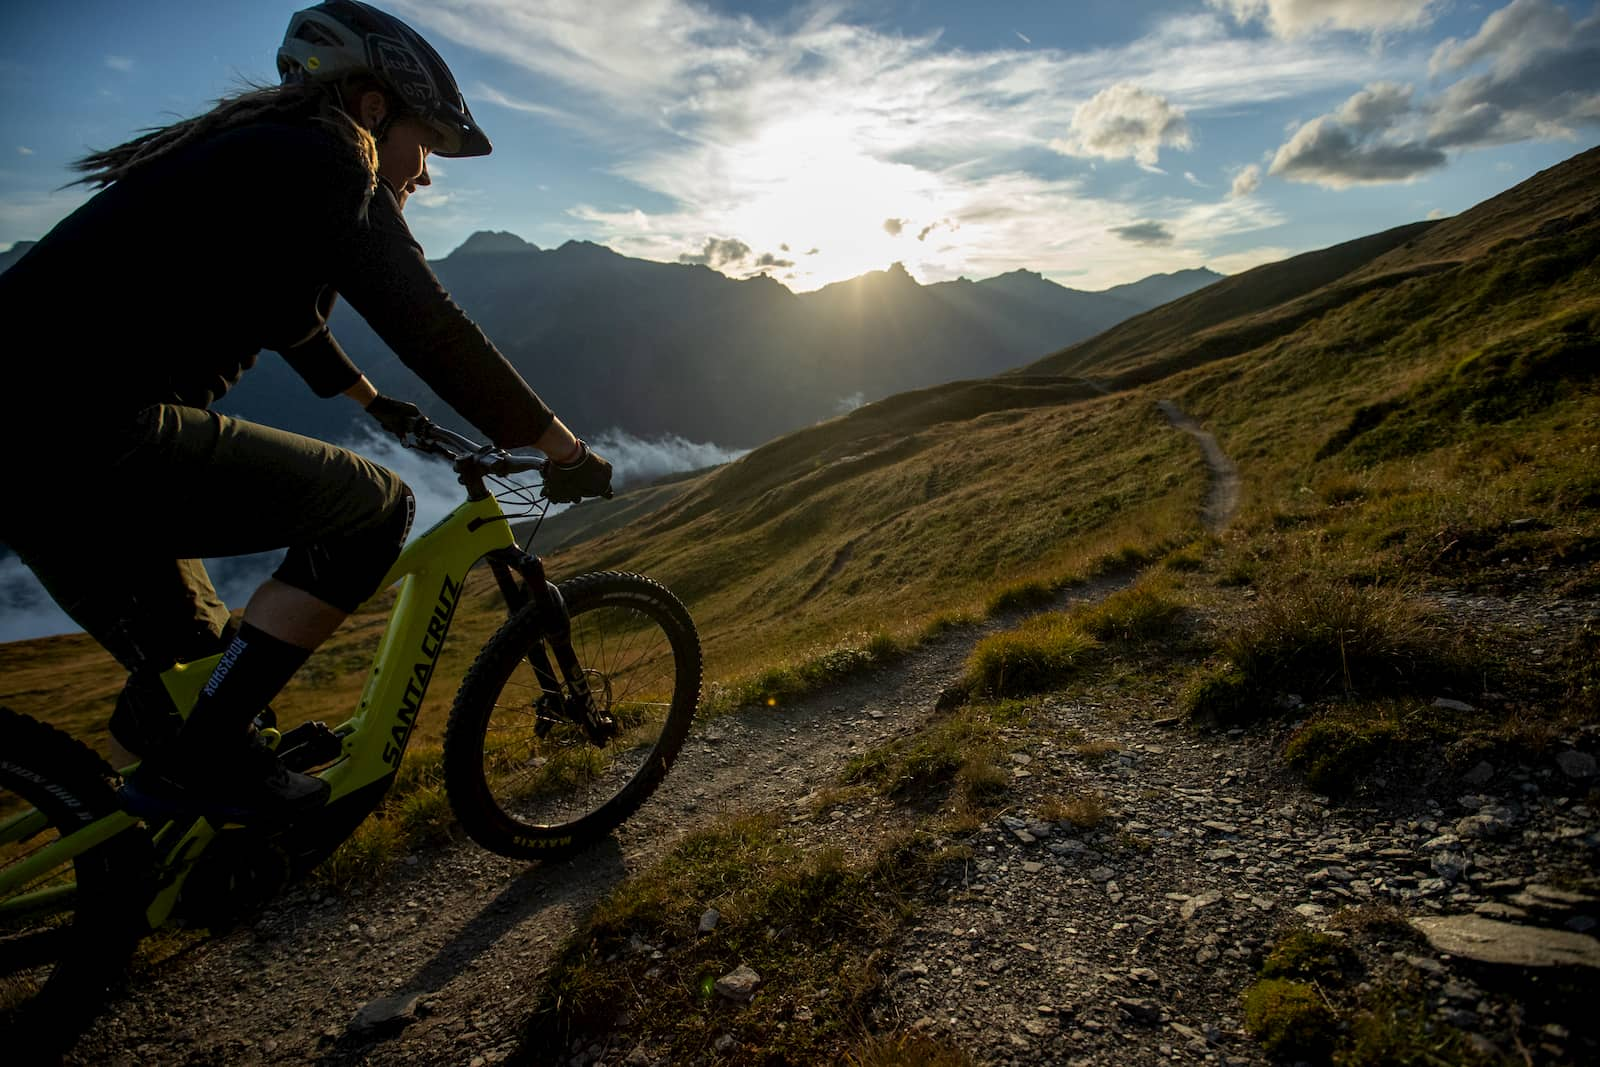 Santa Cruz Bikes Pros and Cons